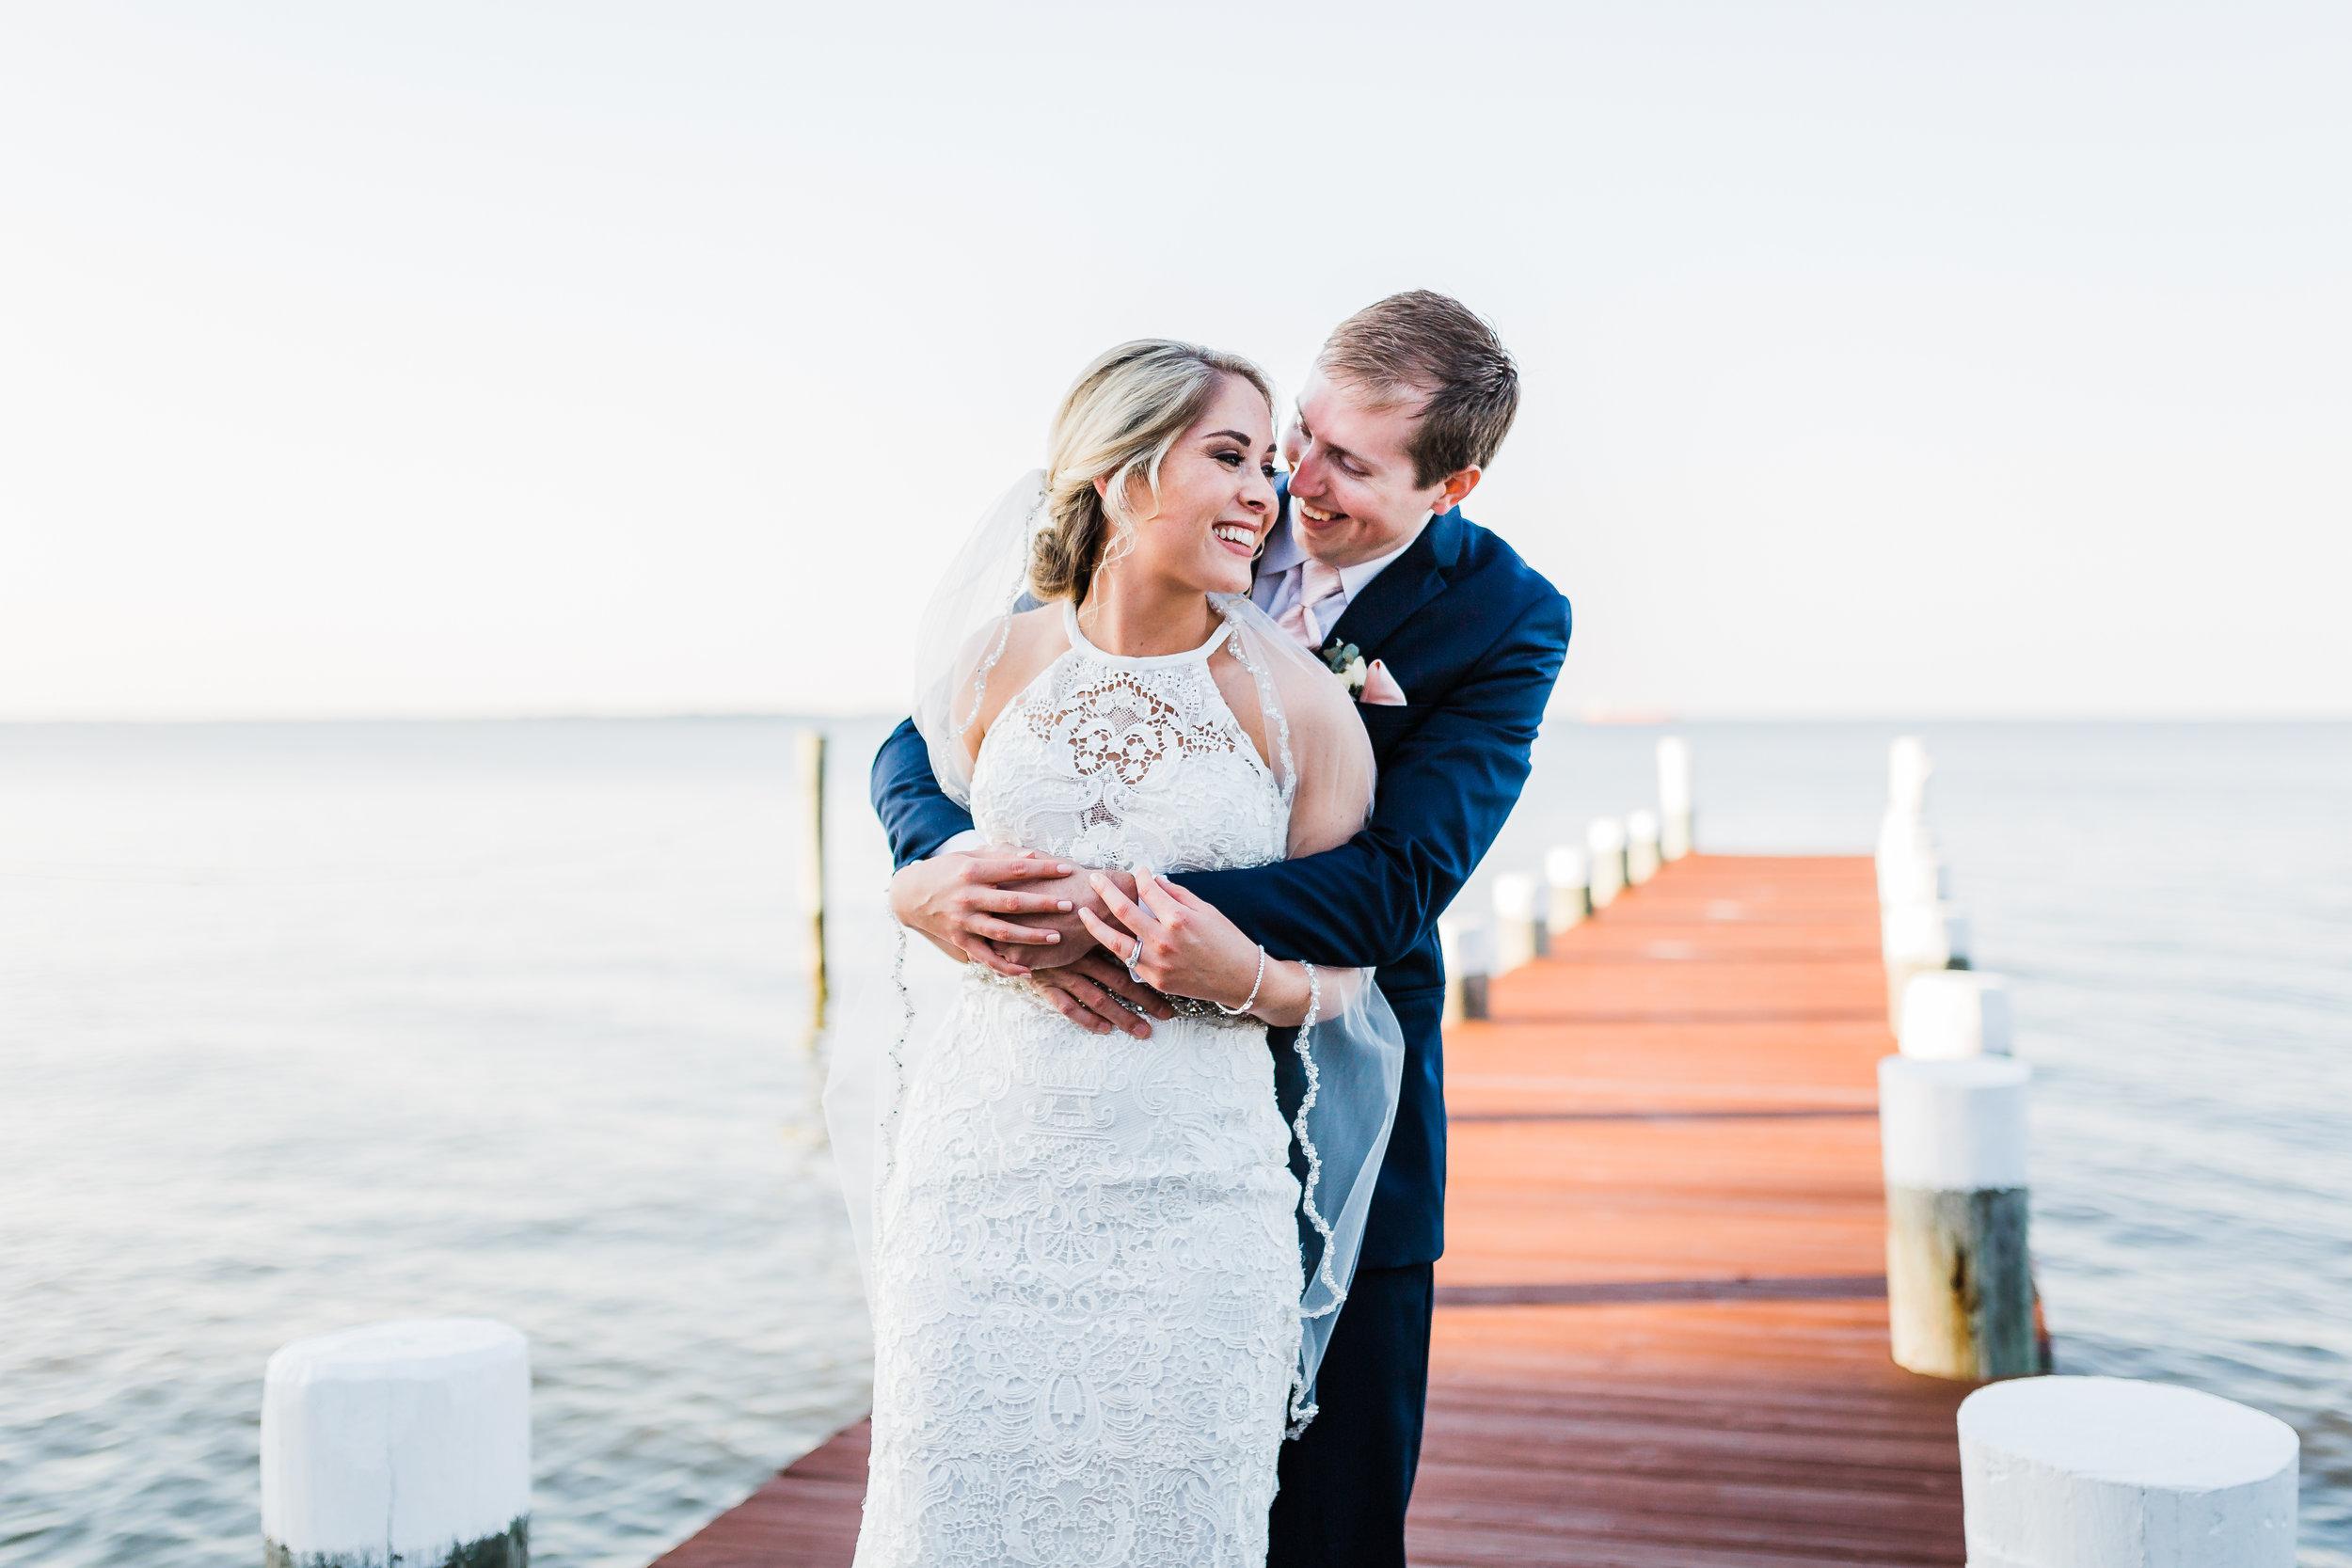 waterfront wedding venue in maryland - bayside wedding - bride and groom - md wedding photo and film